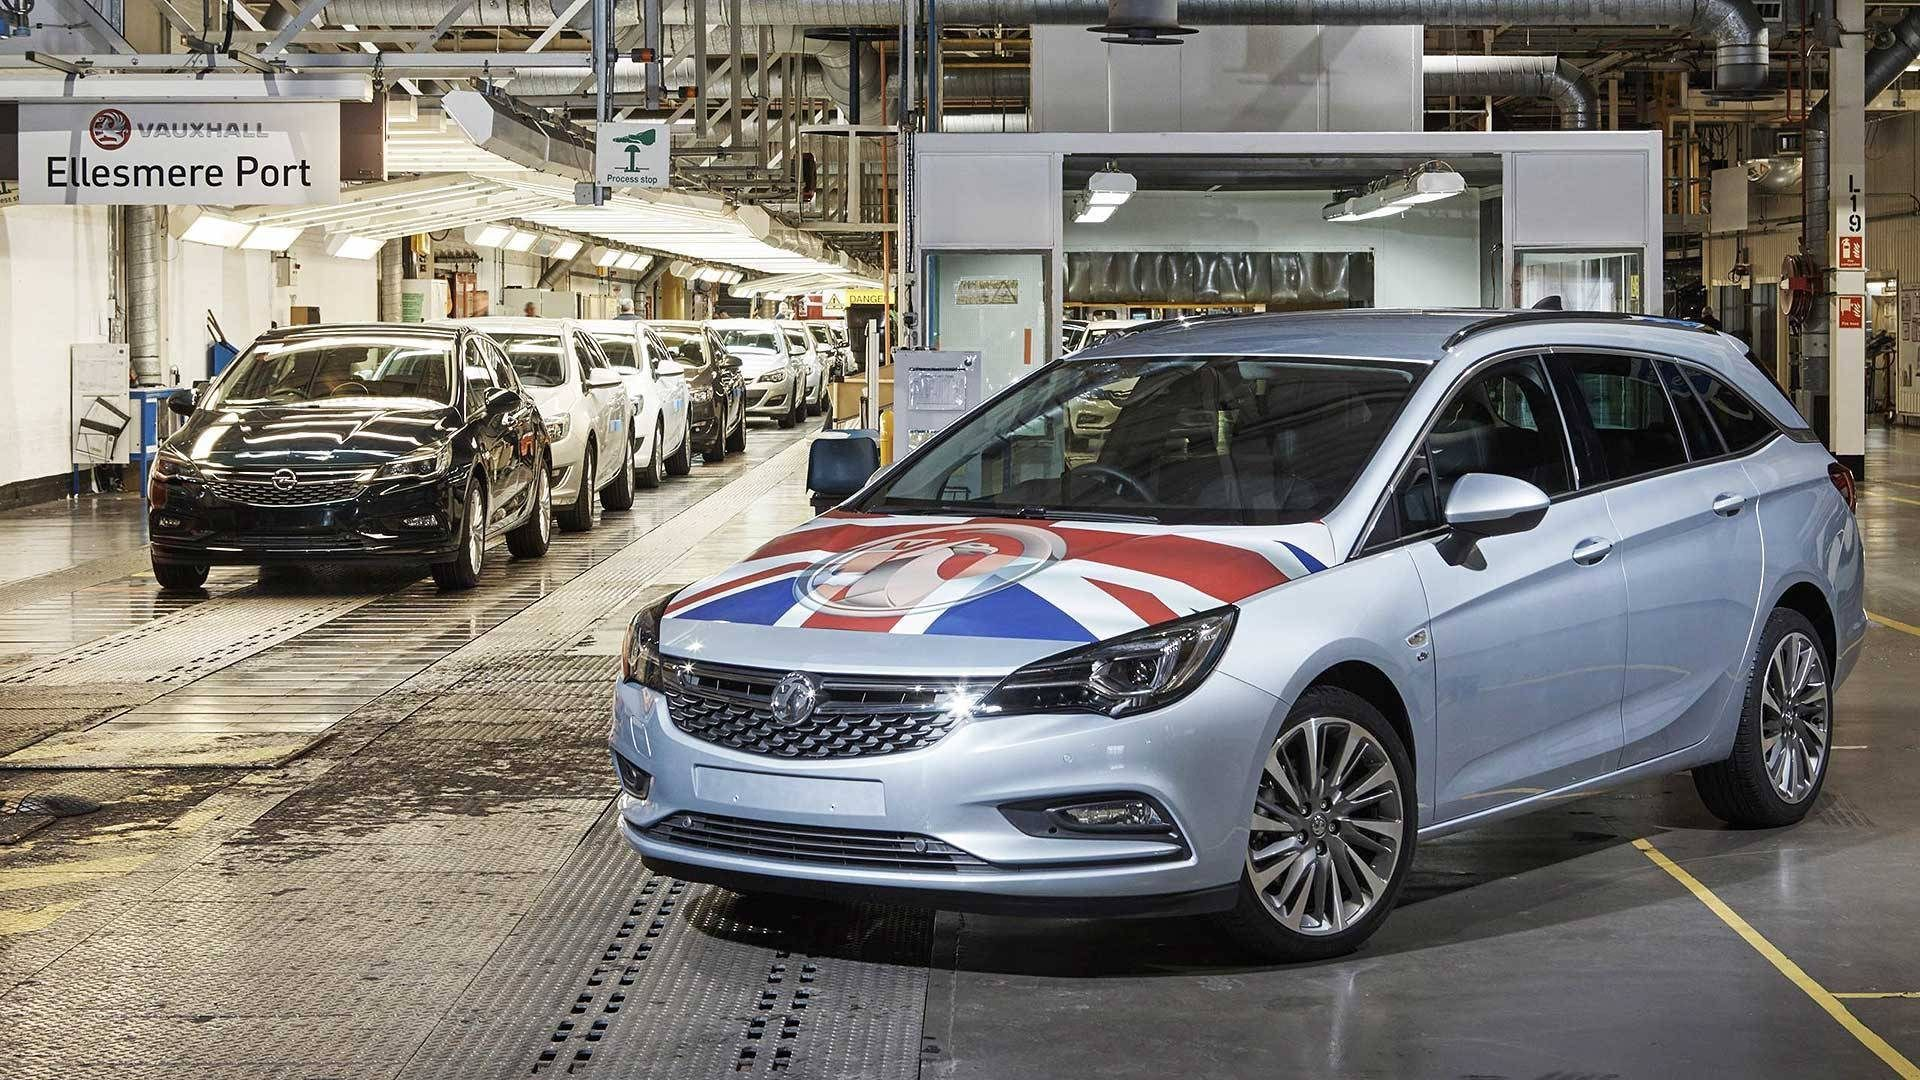 2021 Vauxhall Corsa Vxr First Drive in 2020 | Vauxhall ...